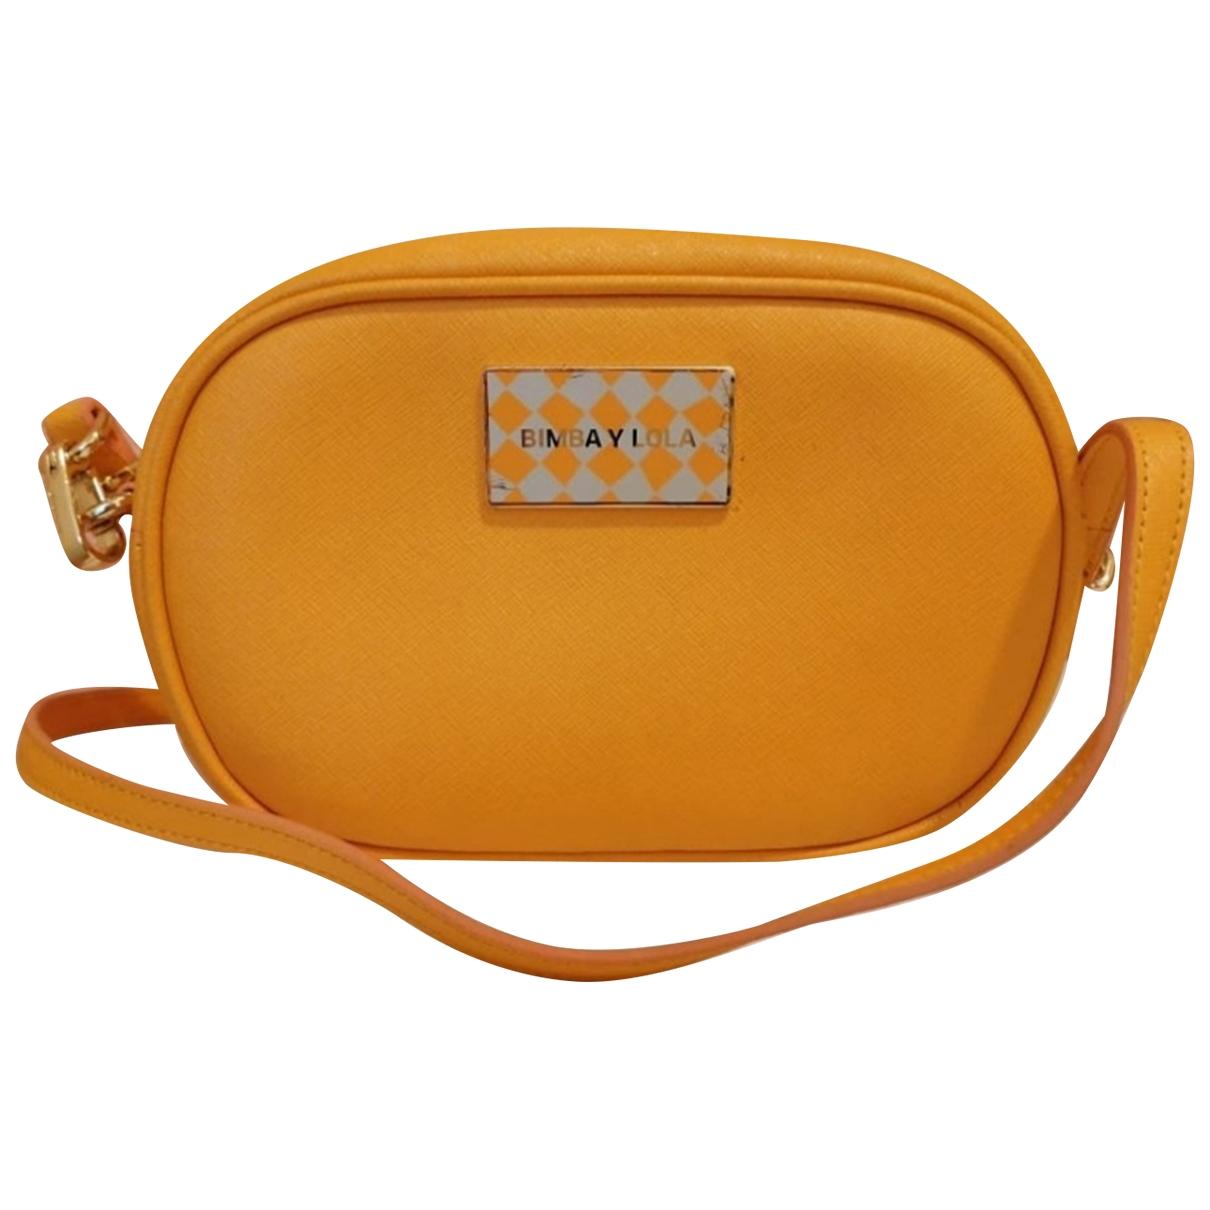 Bimba Y Lola \N Yellow Leather handbag for Women \N